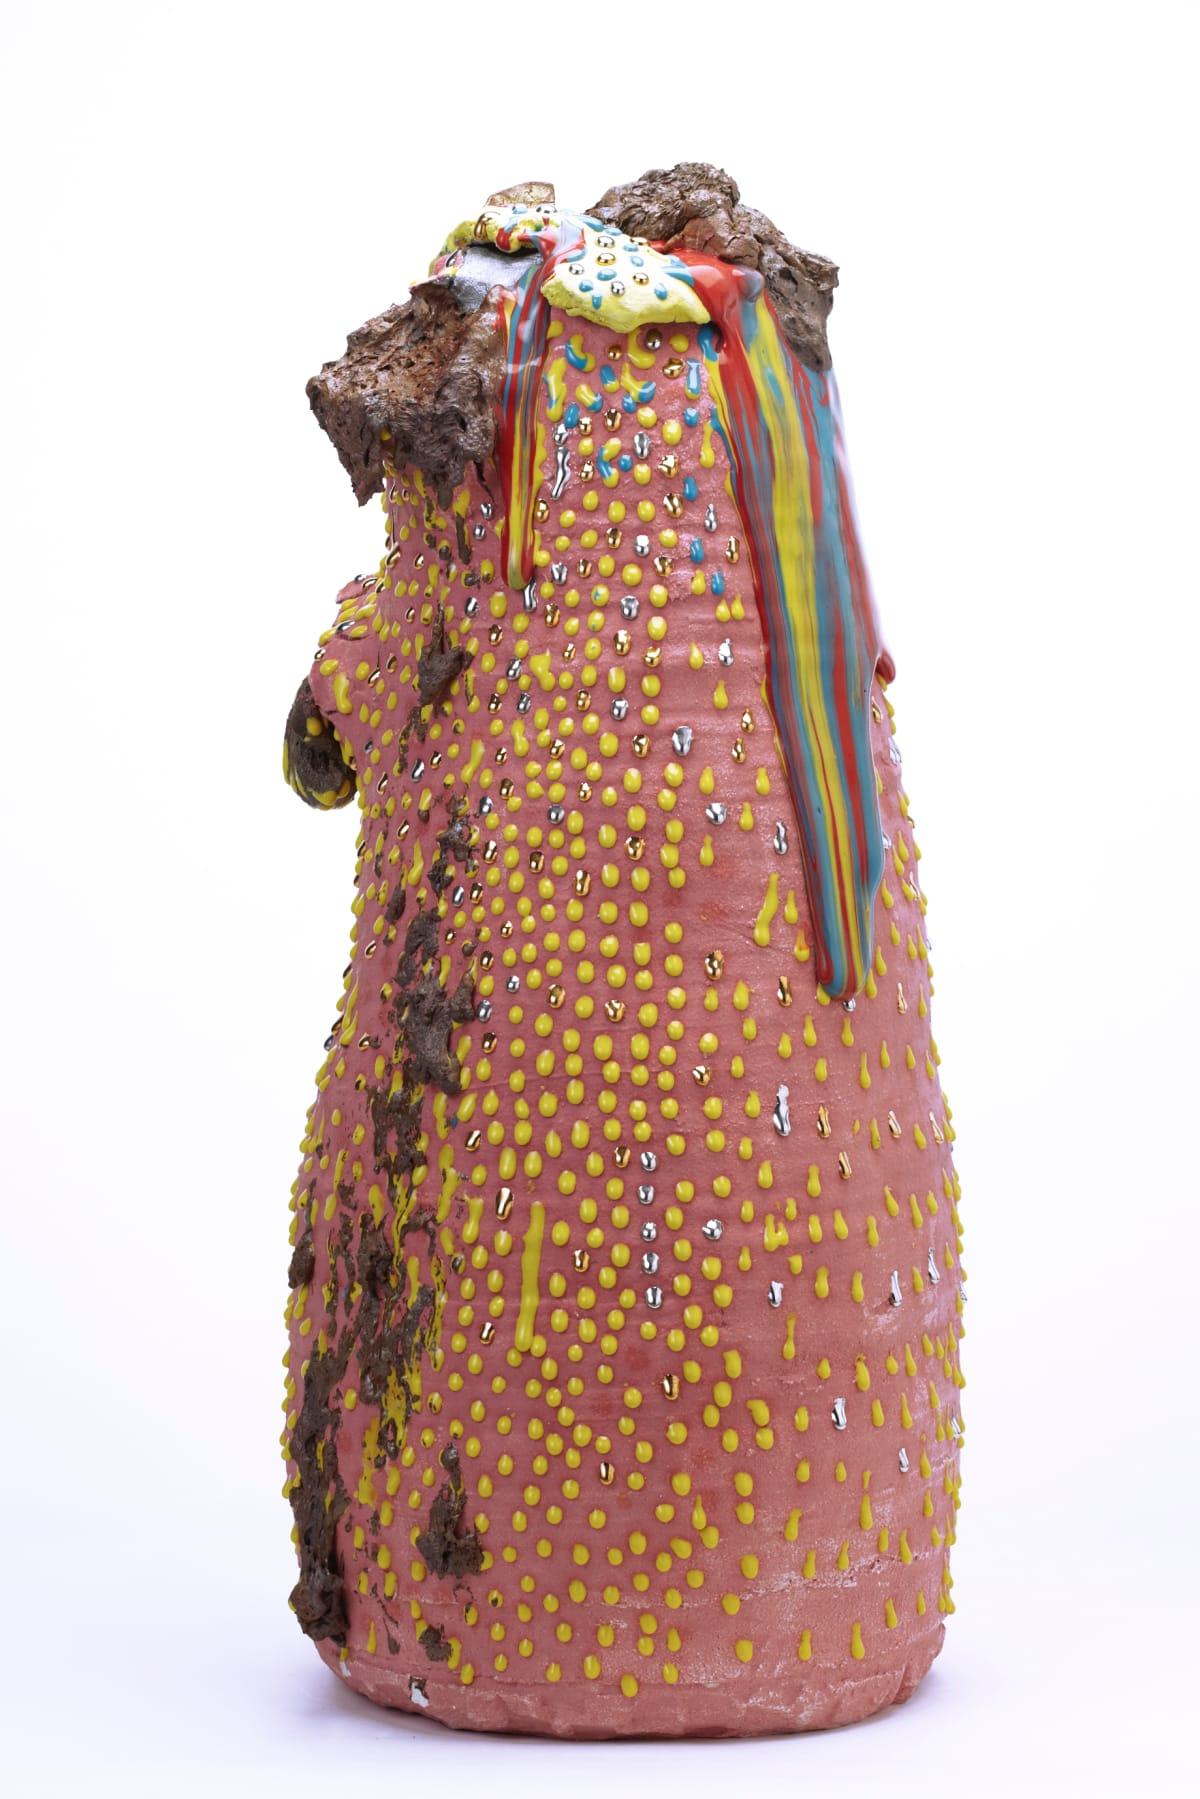 Takuro Kuwata, Sweating Momoko with Make-up, 2014